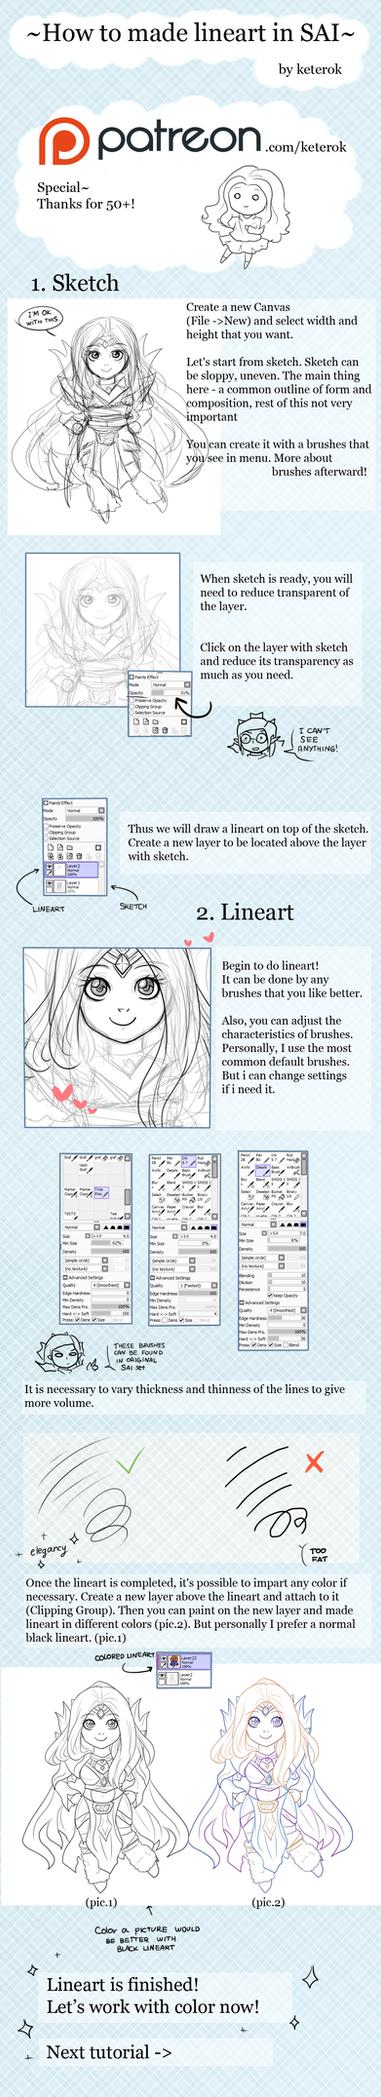 Lineart tutorials on painttoolsai deviantart how i draw lineart in sai tutorial by keterok baditri Gallery